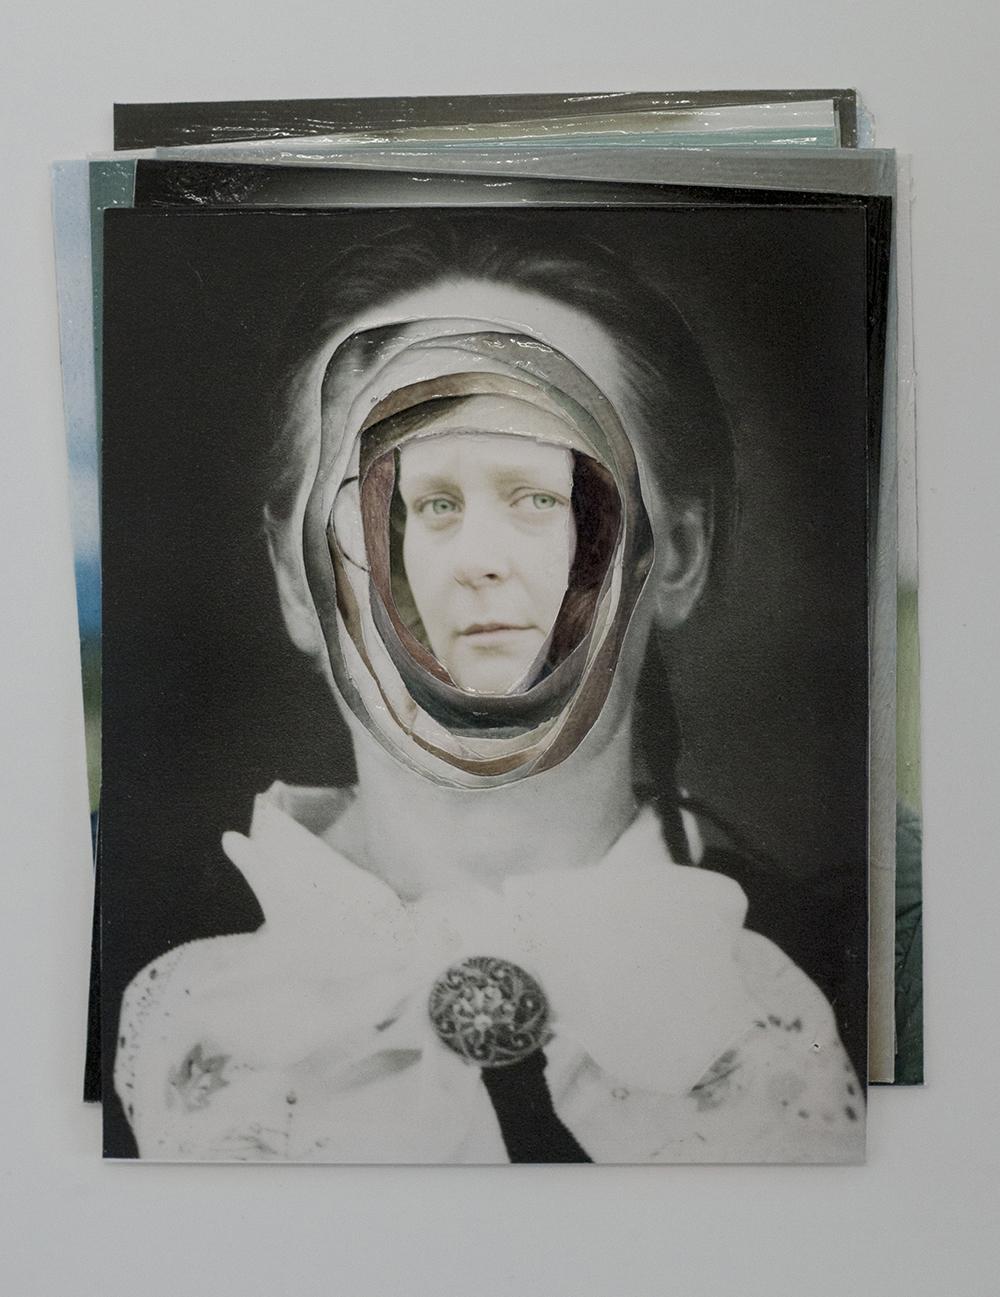 María Kristín Hassing Antonsdóttir, Untitled #3, 2018.